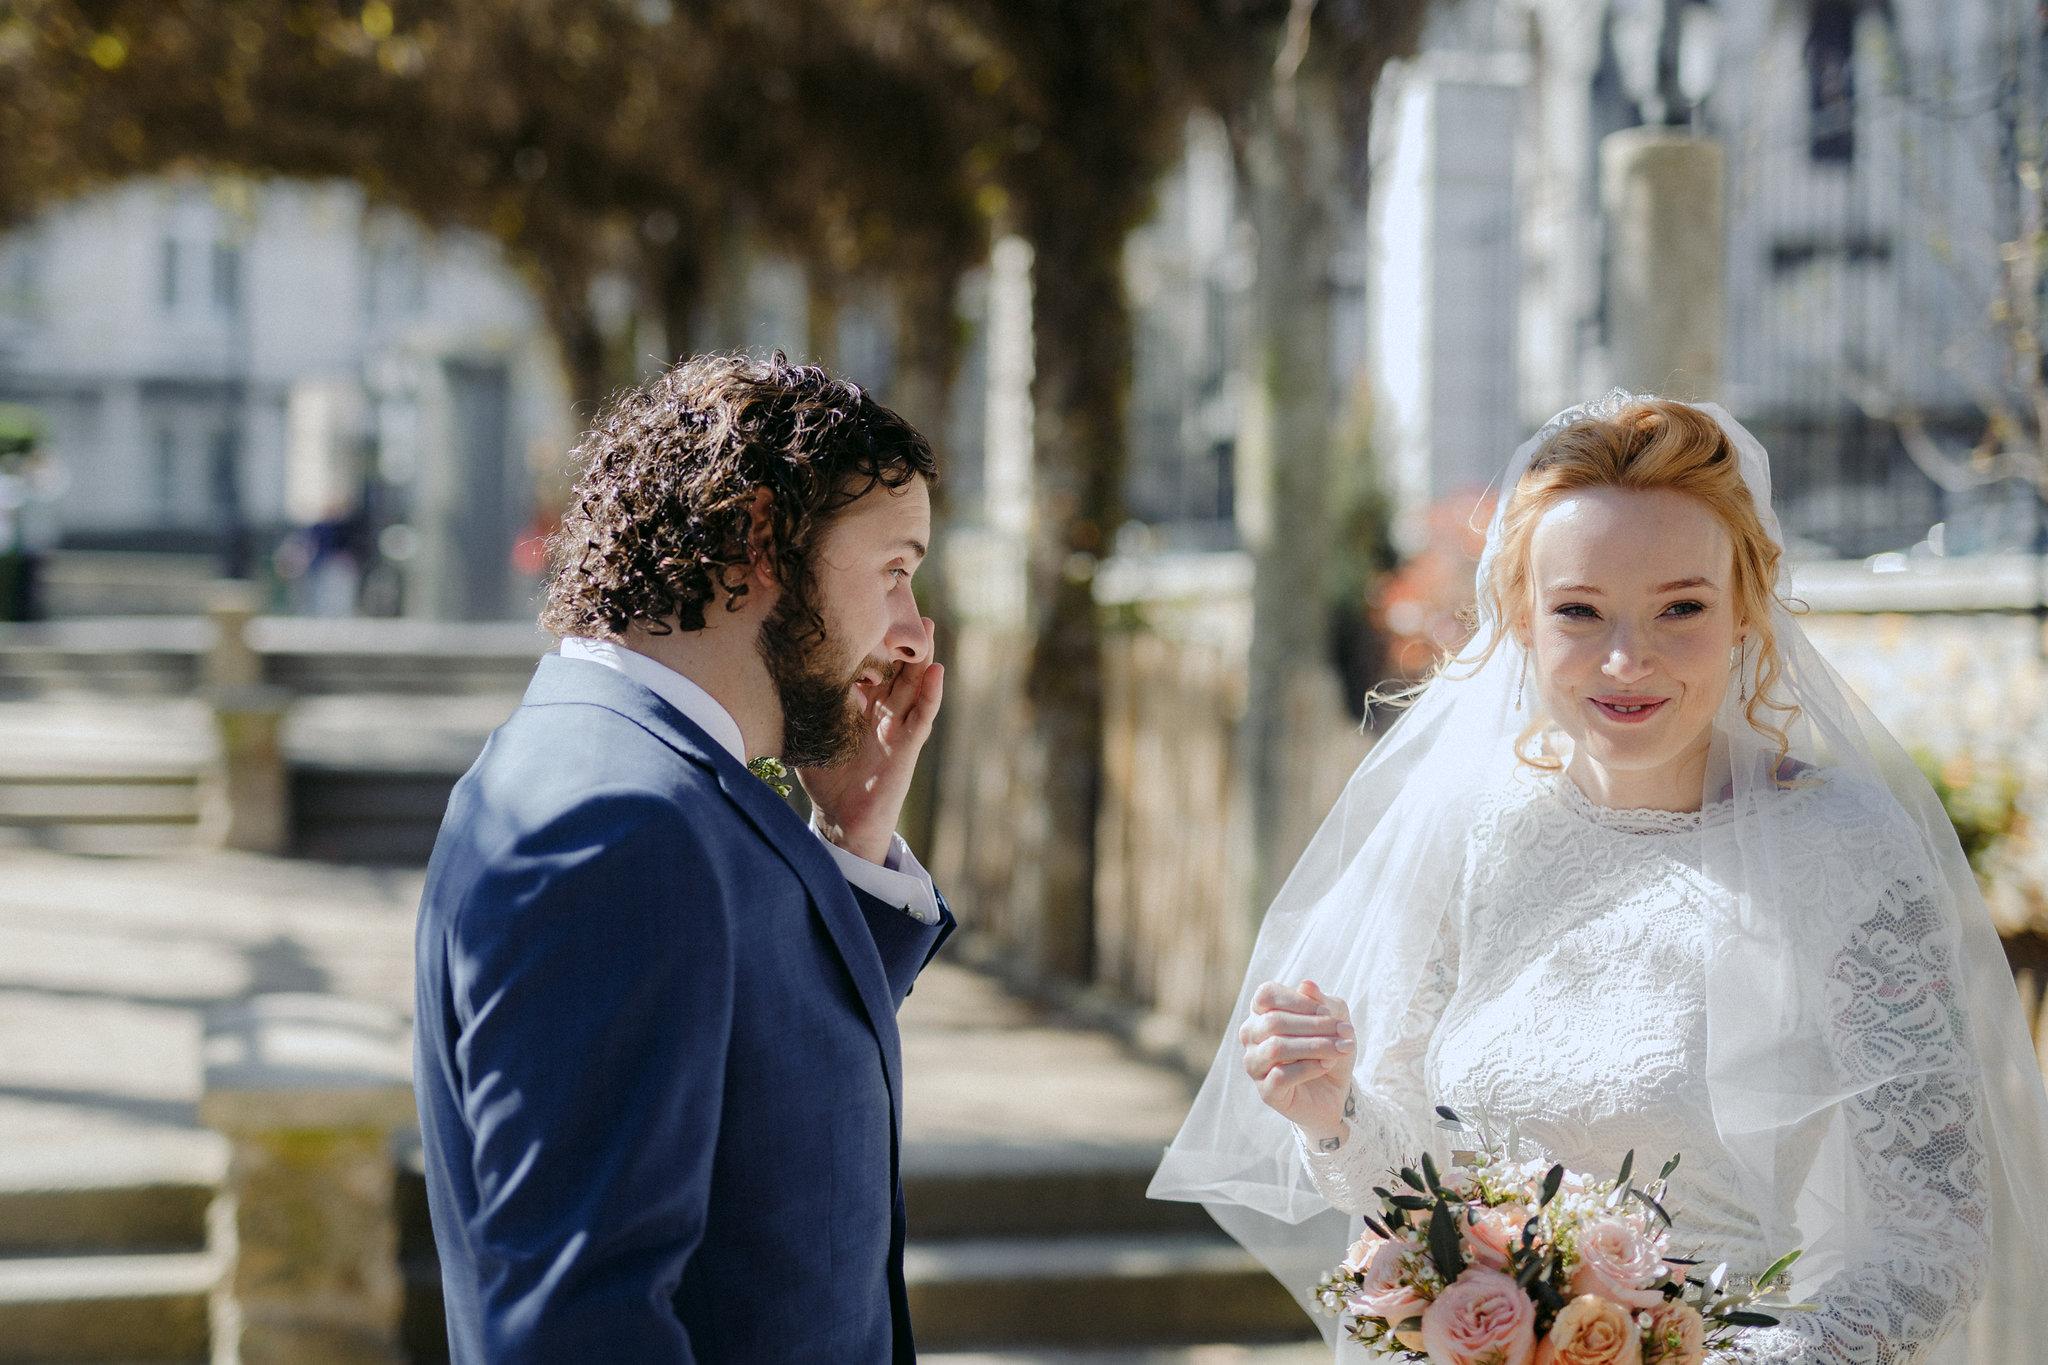 Paris_elopement_wedding_photographer-187.jpg